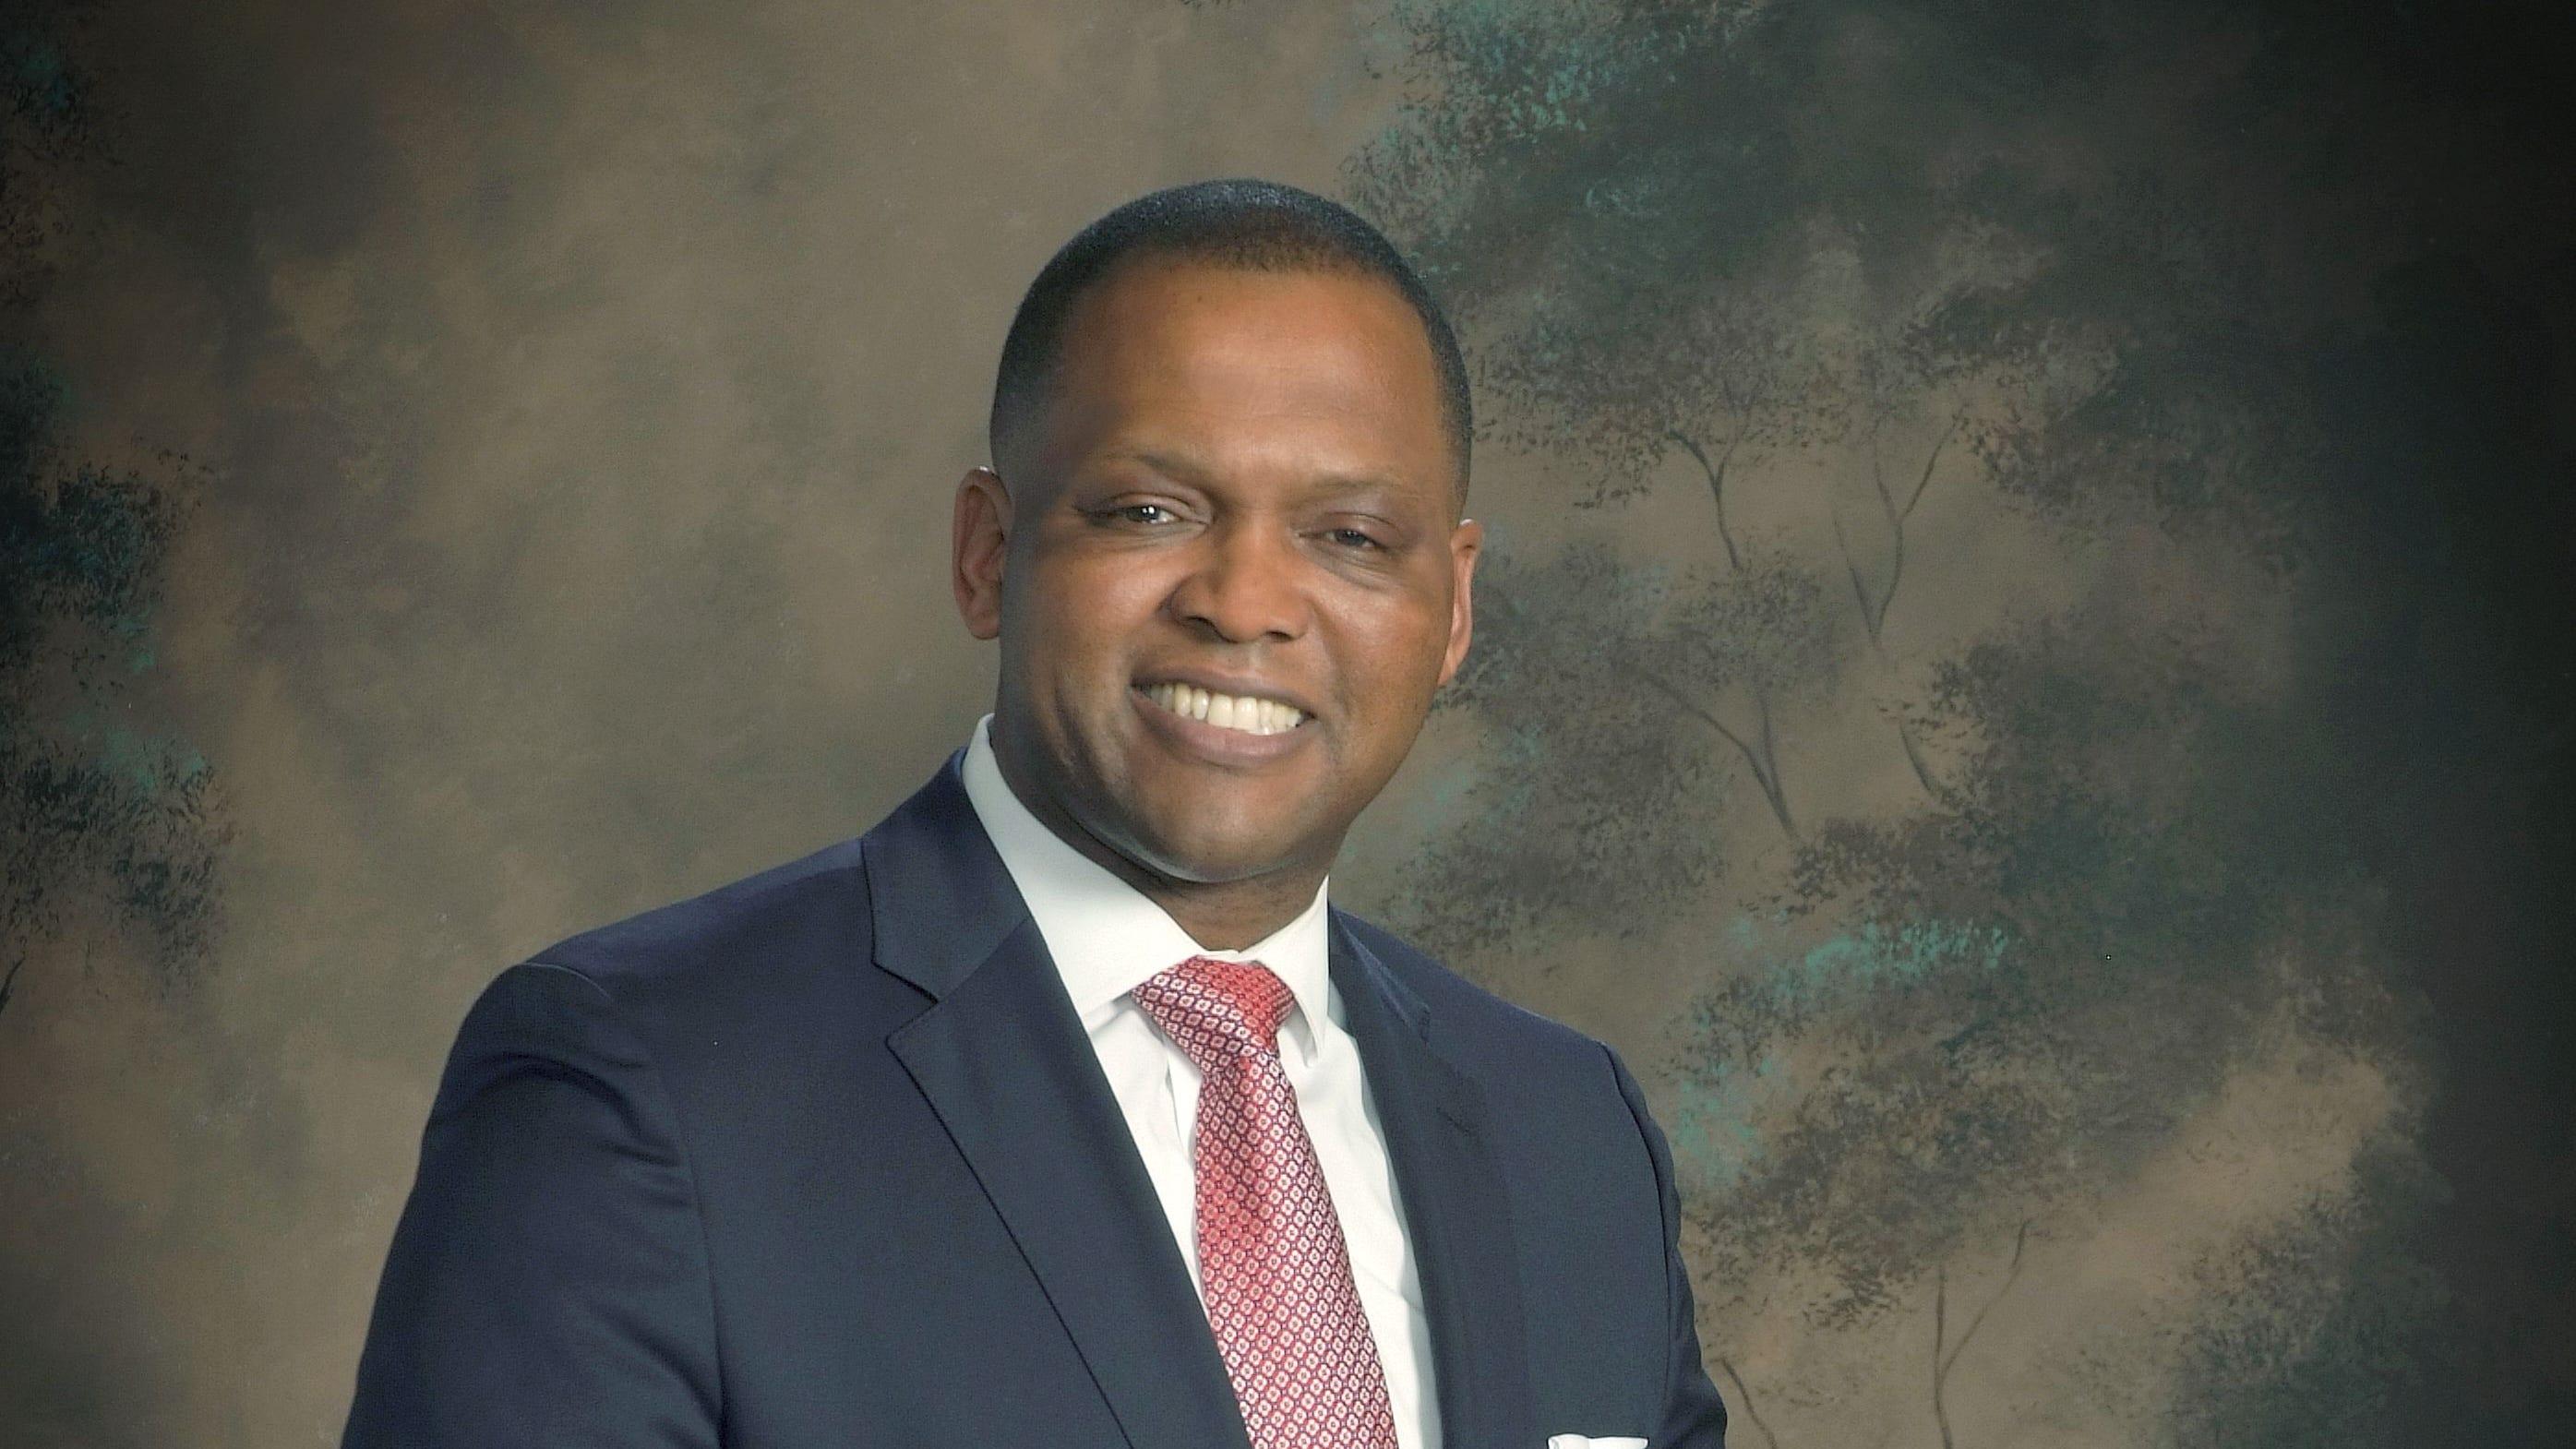 Dr. T. Lamar Goree